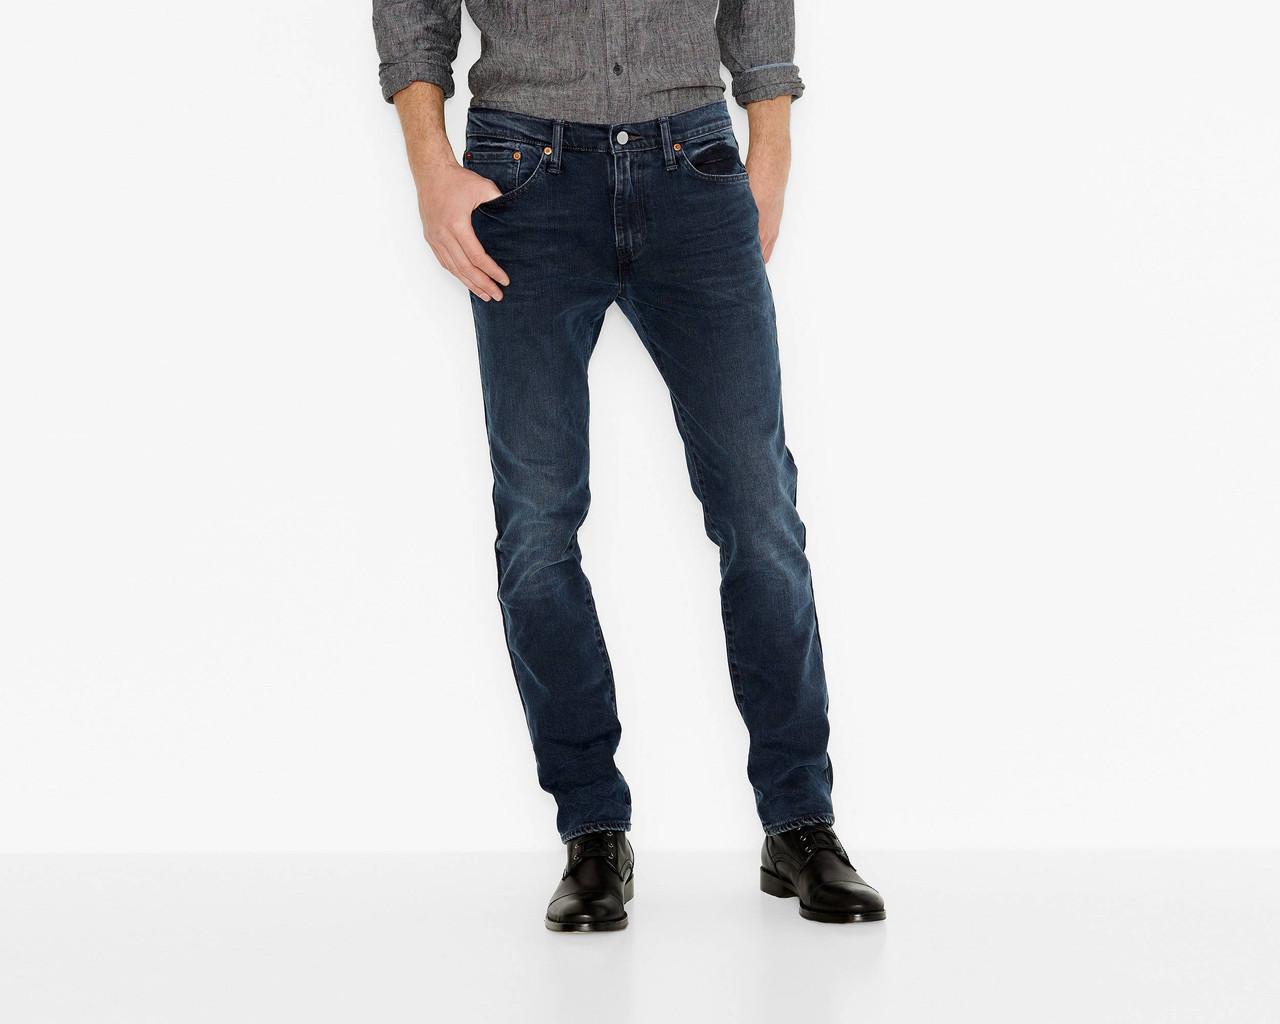 Джинсы Levi's 511 Slim Fit, Red Bluff, 36W36L, 045111771